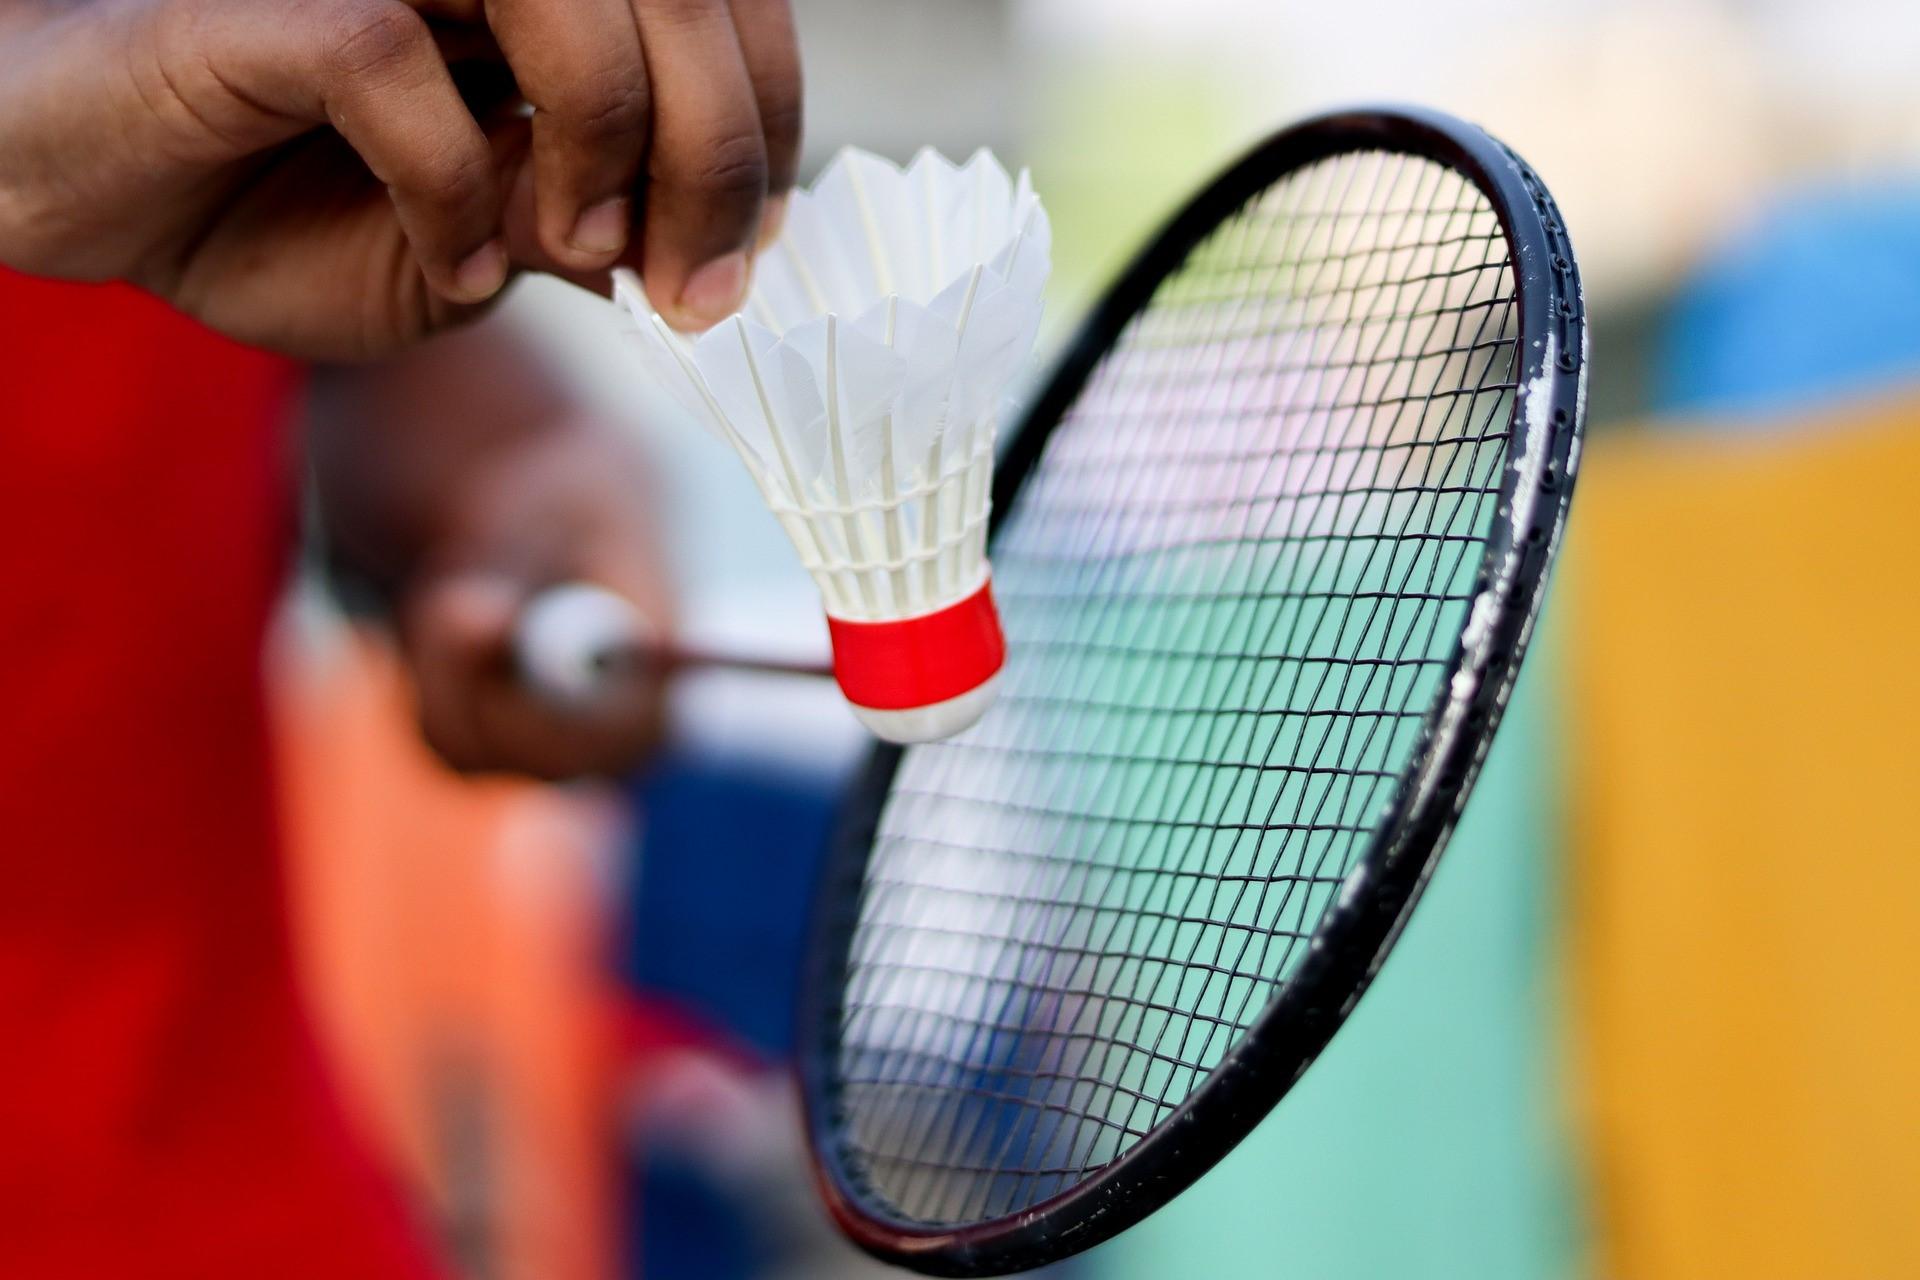 https://i2.wp.com/bwbuemmerstede.de/wp-content/uploads/2021/10/badminton.jpg?fit=1920%2C1280&ssl=1